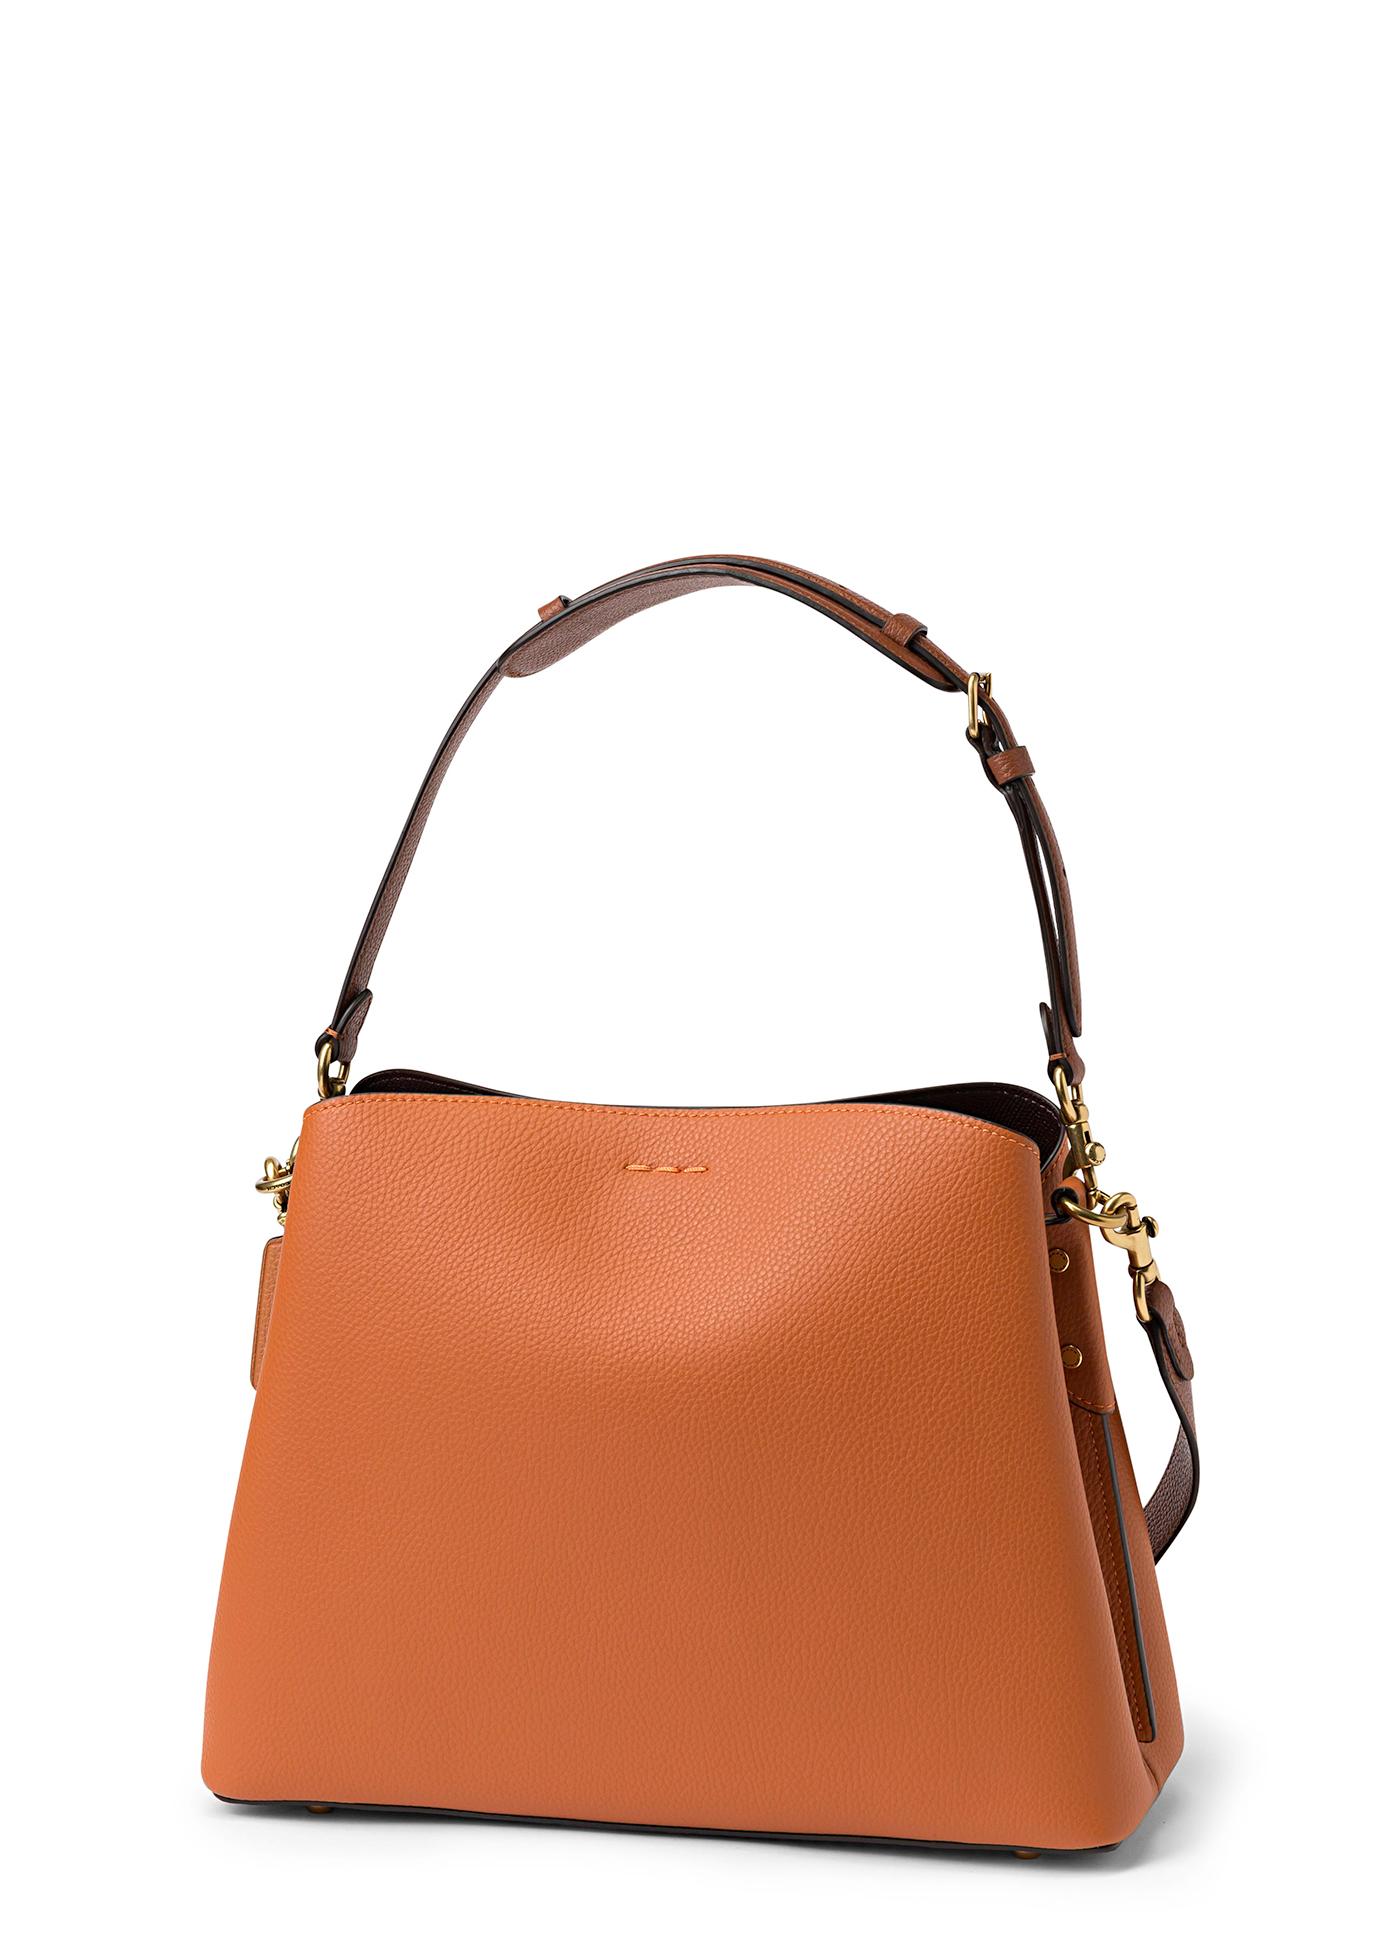 colorblock leather willow shoulder bag image number 1